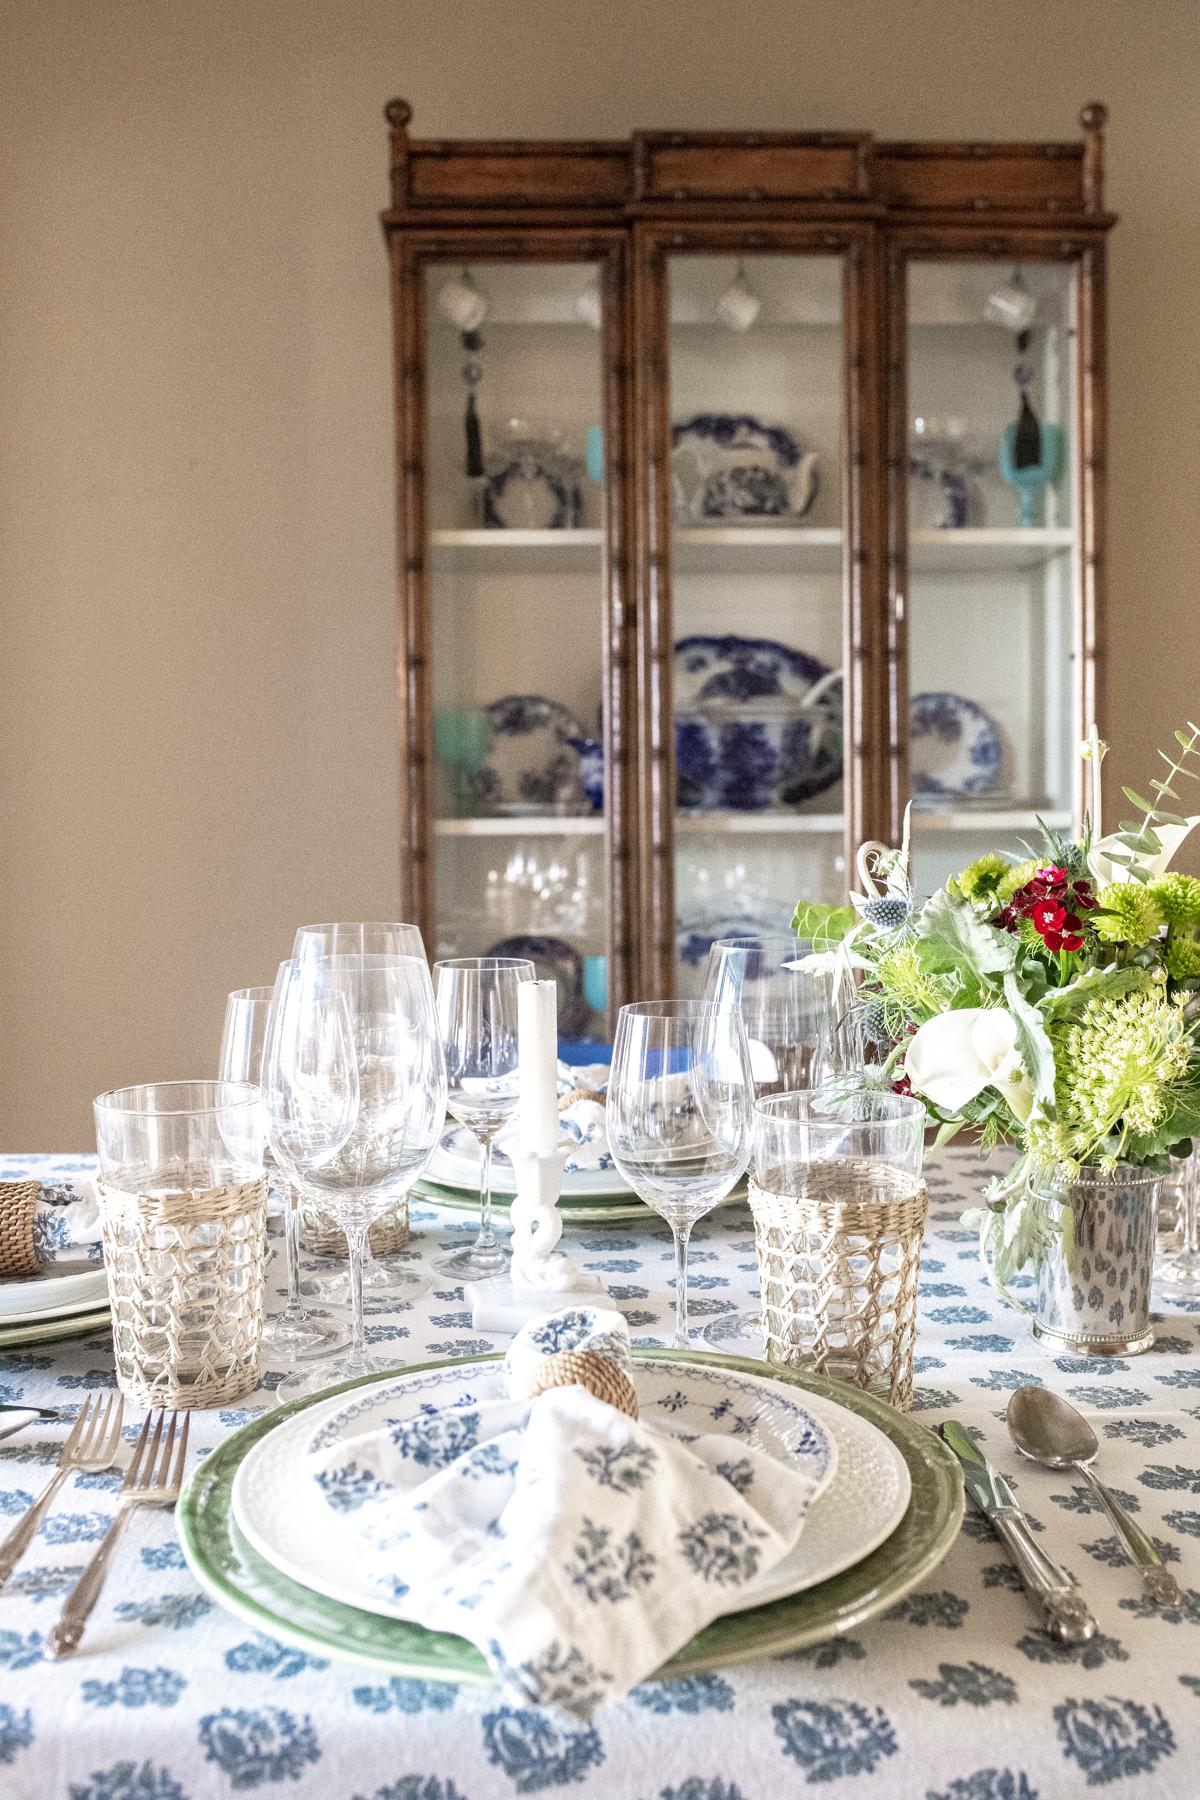 Spring Dinner Party Table x Pottery Barn  x Stacie Flinner-23.jpg